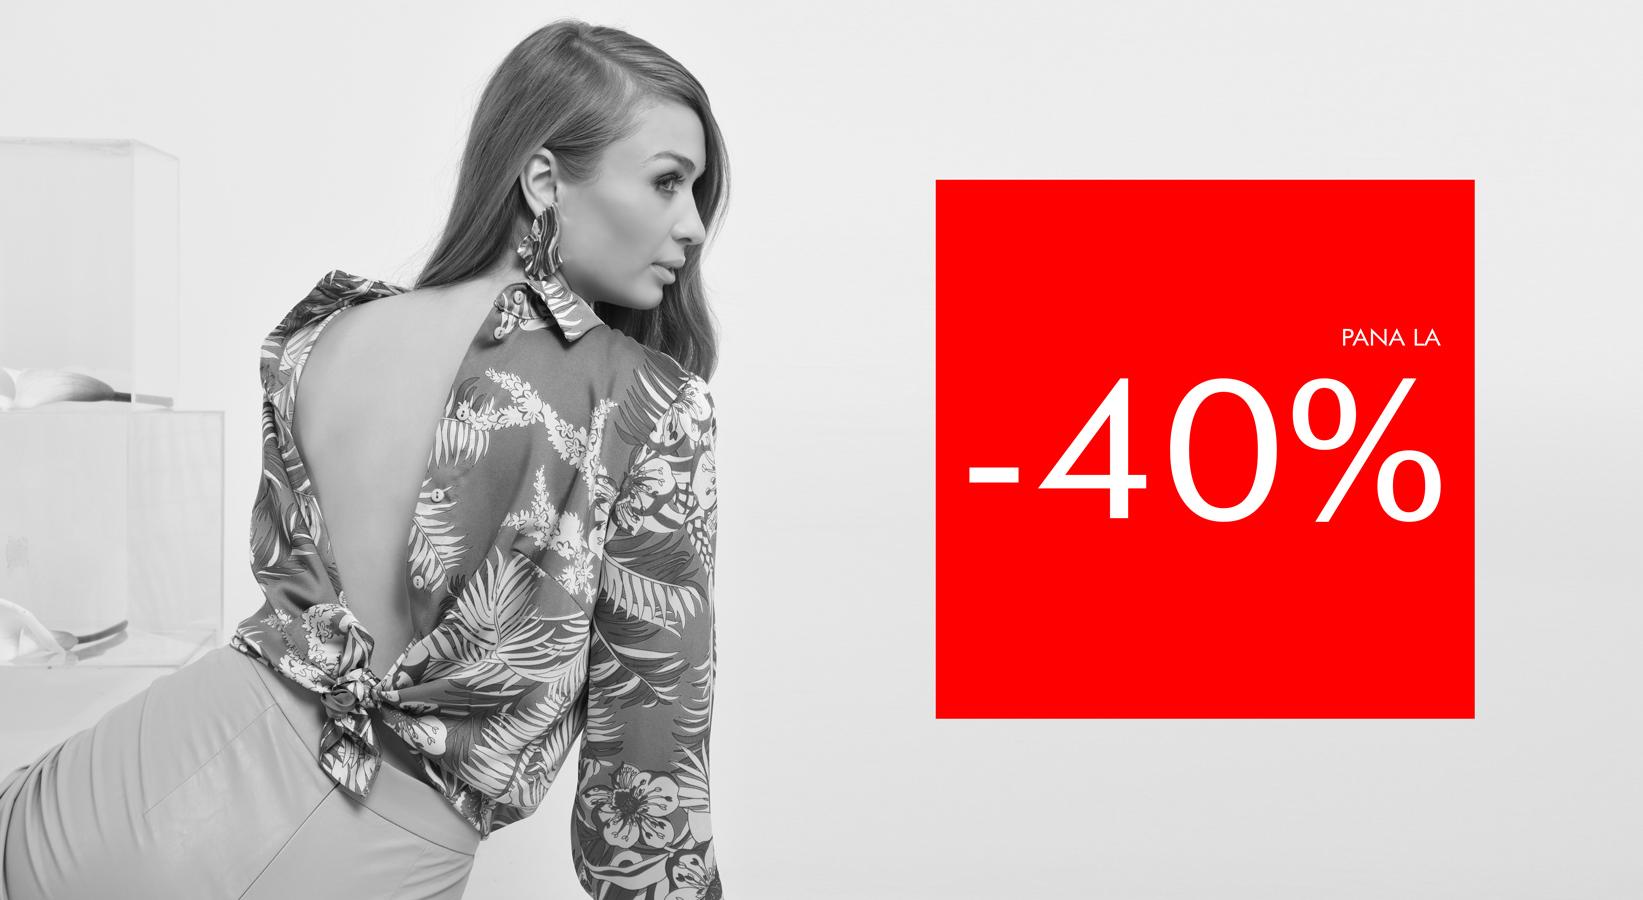 Promotii POEMA: pana la -40% la sute de articole.